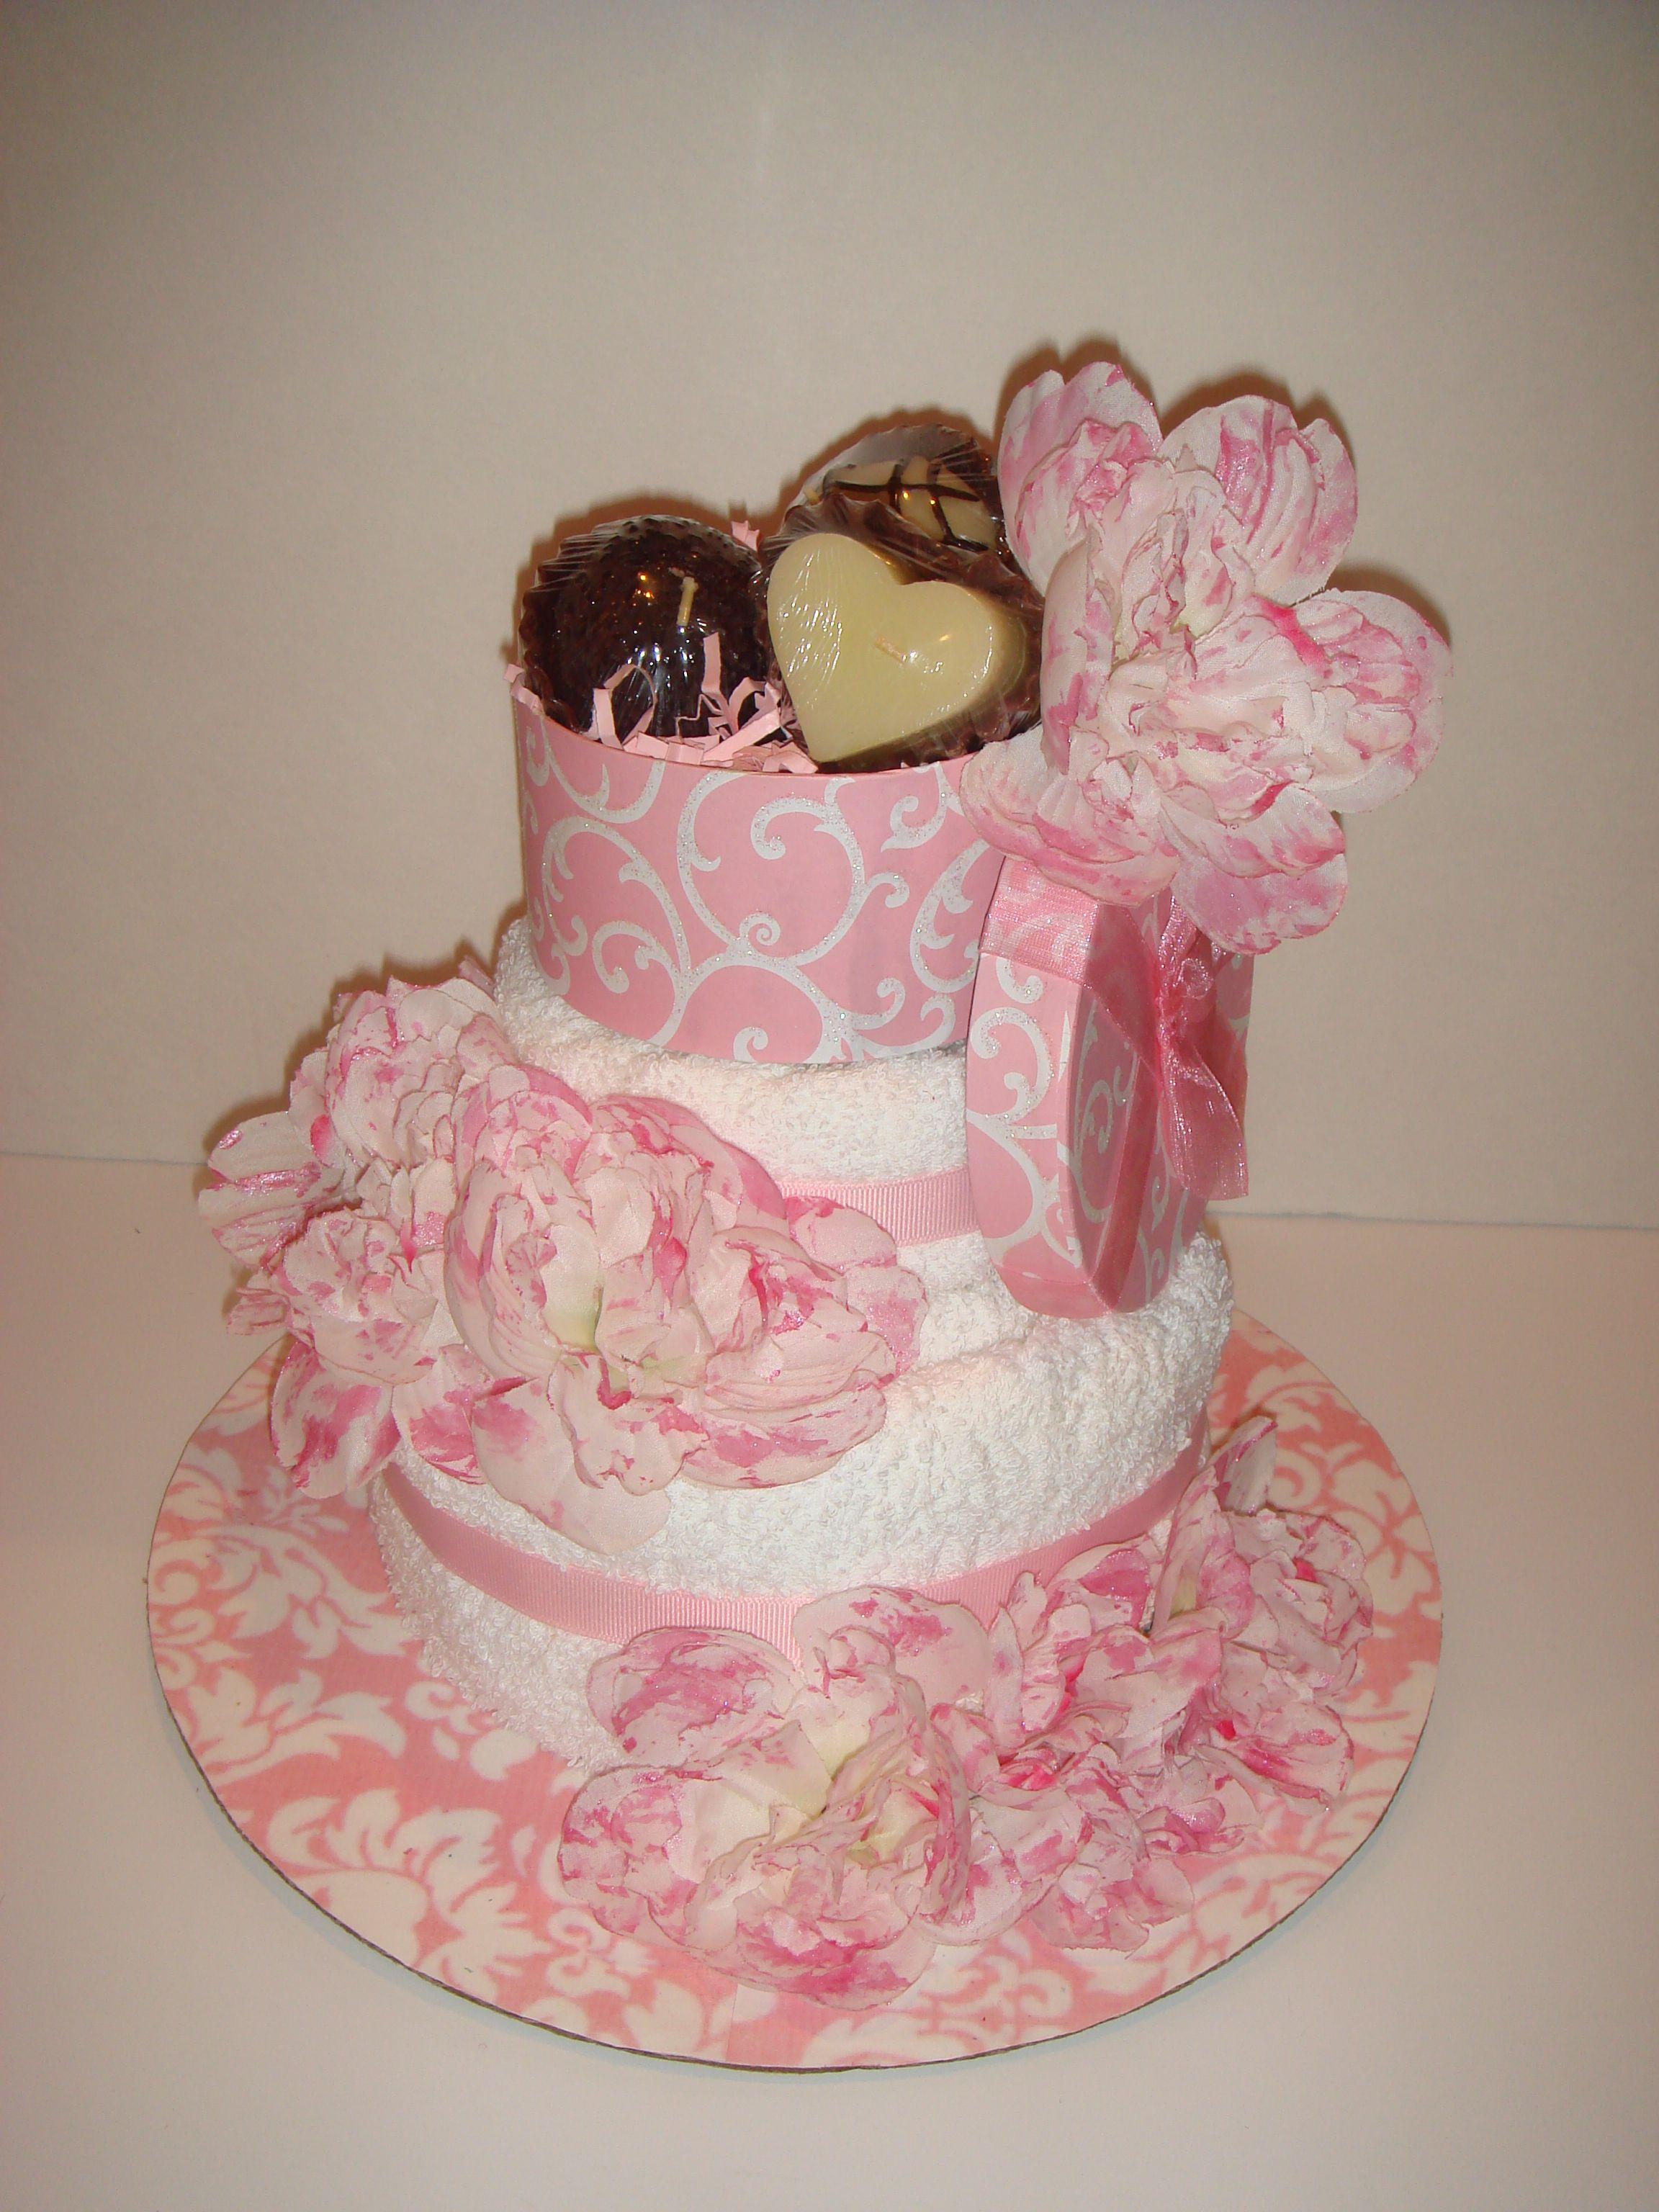 Pretty in Pink Towel Cake Pink towels, Cake, Diaper cake